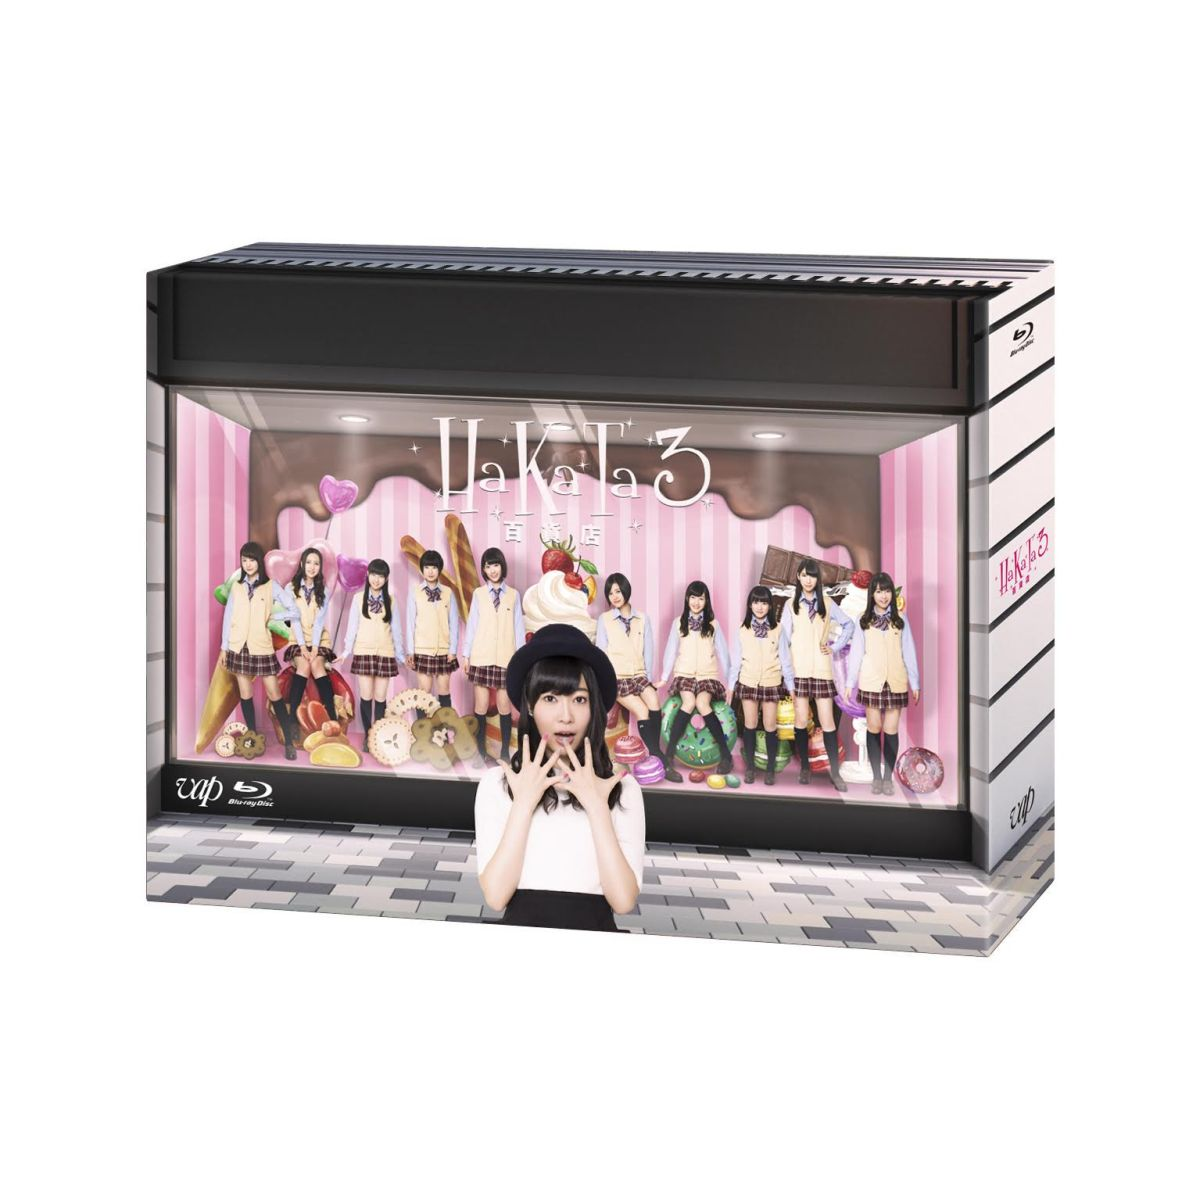 HaKaTa百貨店 3号館 Blu-ray BOX 【Blu-ray】 [ ジャングルポケット ]